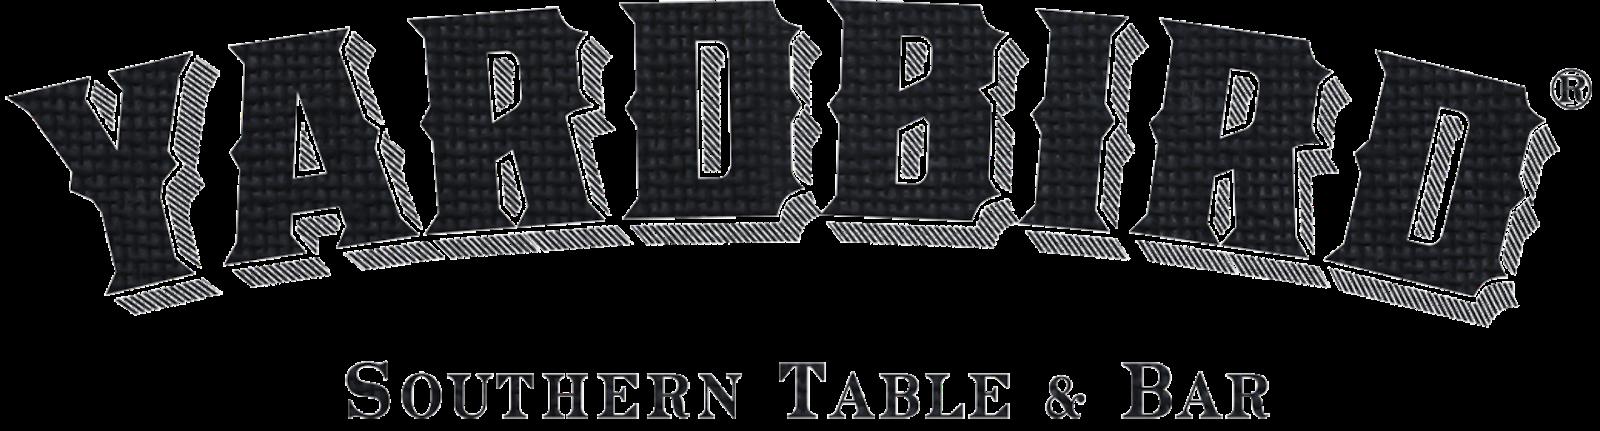 https://www.runchickenrun.com/wp-content/uploads/2019/12/Yardbird_Logo-1-1920x517.png